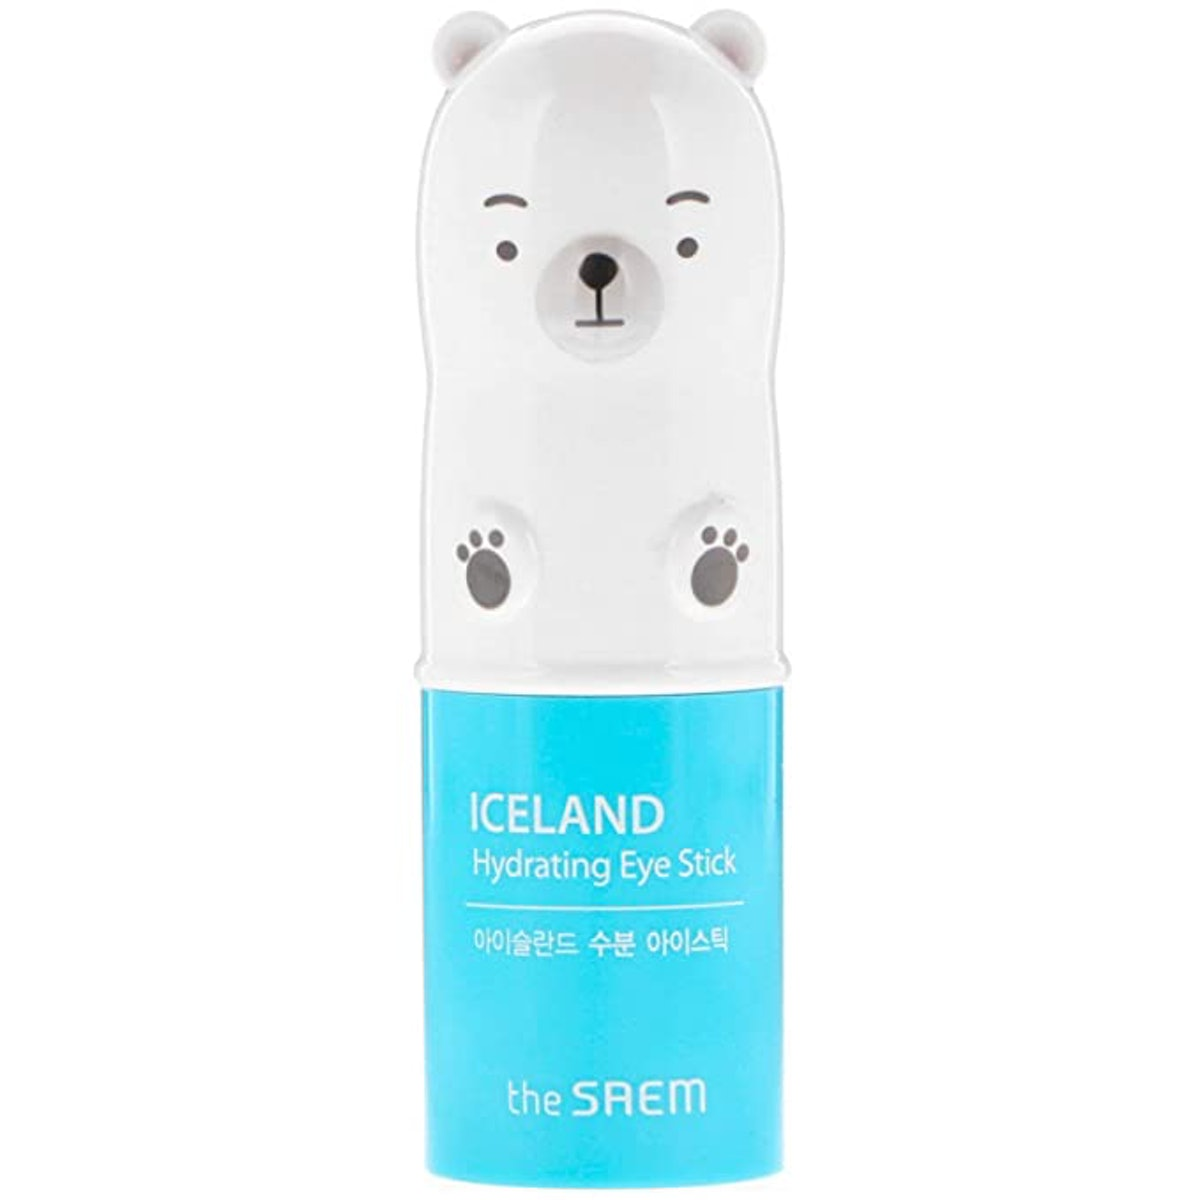 THESAEM Iceland Hydrating Eye Stick